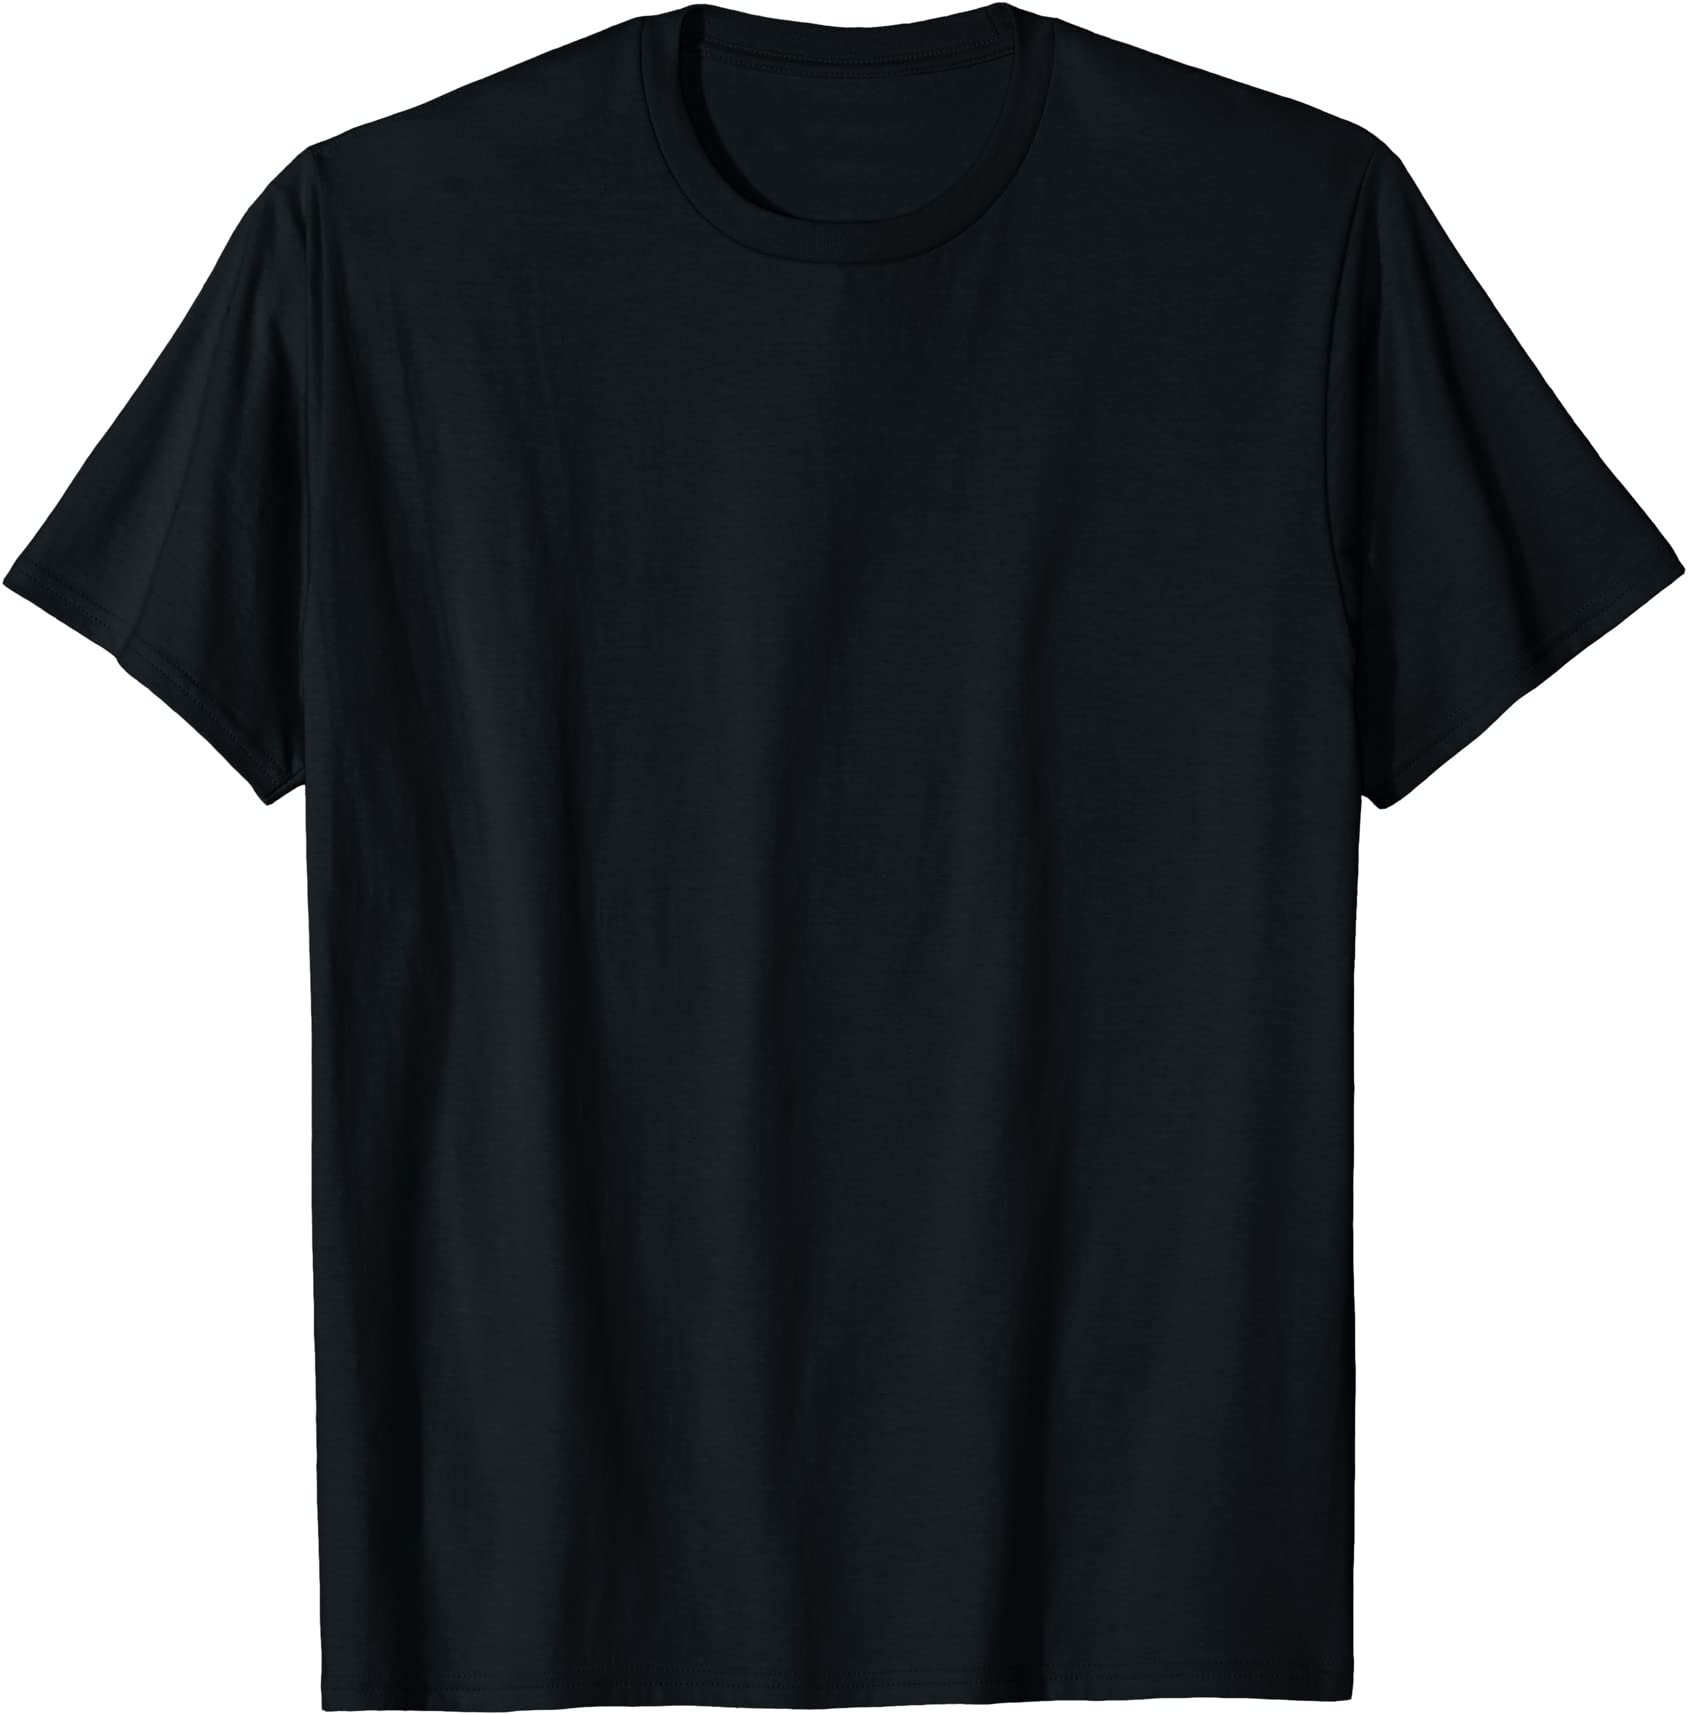 Kids T-Shirt Tops Black Vintage Electric Guitar Unisex Youths Short Sleeve T-Shirt